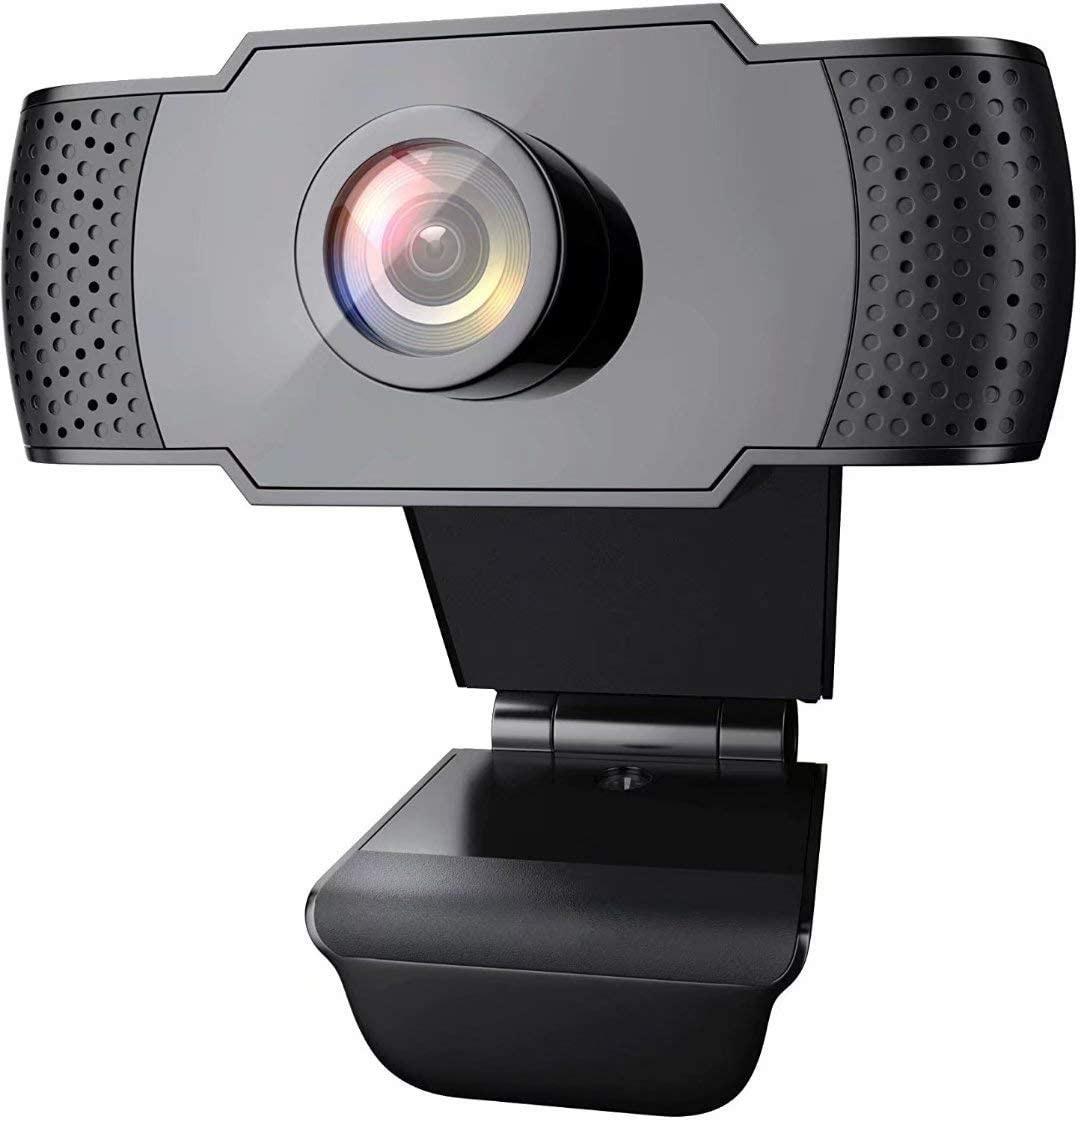 Conqueror Webcam Camera for Laptop, Desktop, and PC - CWC427